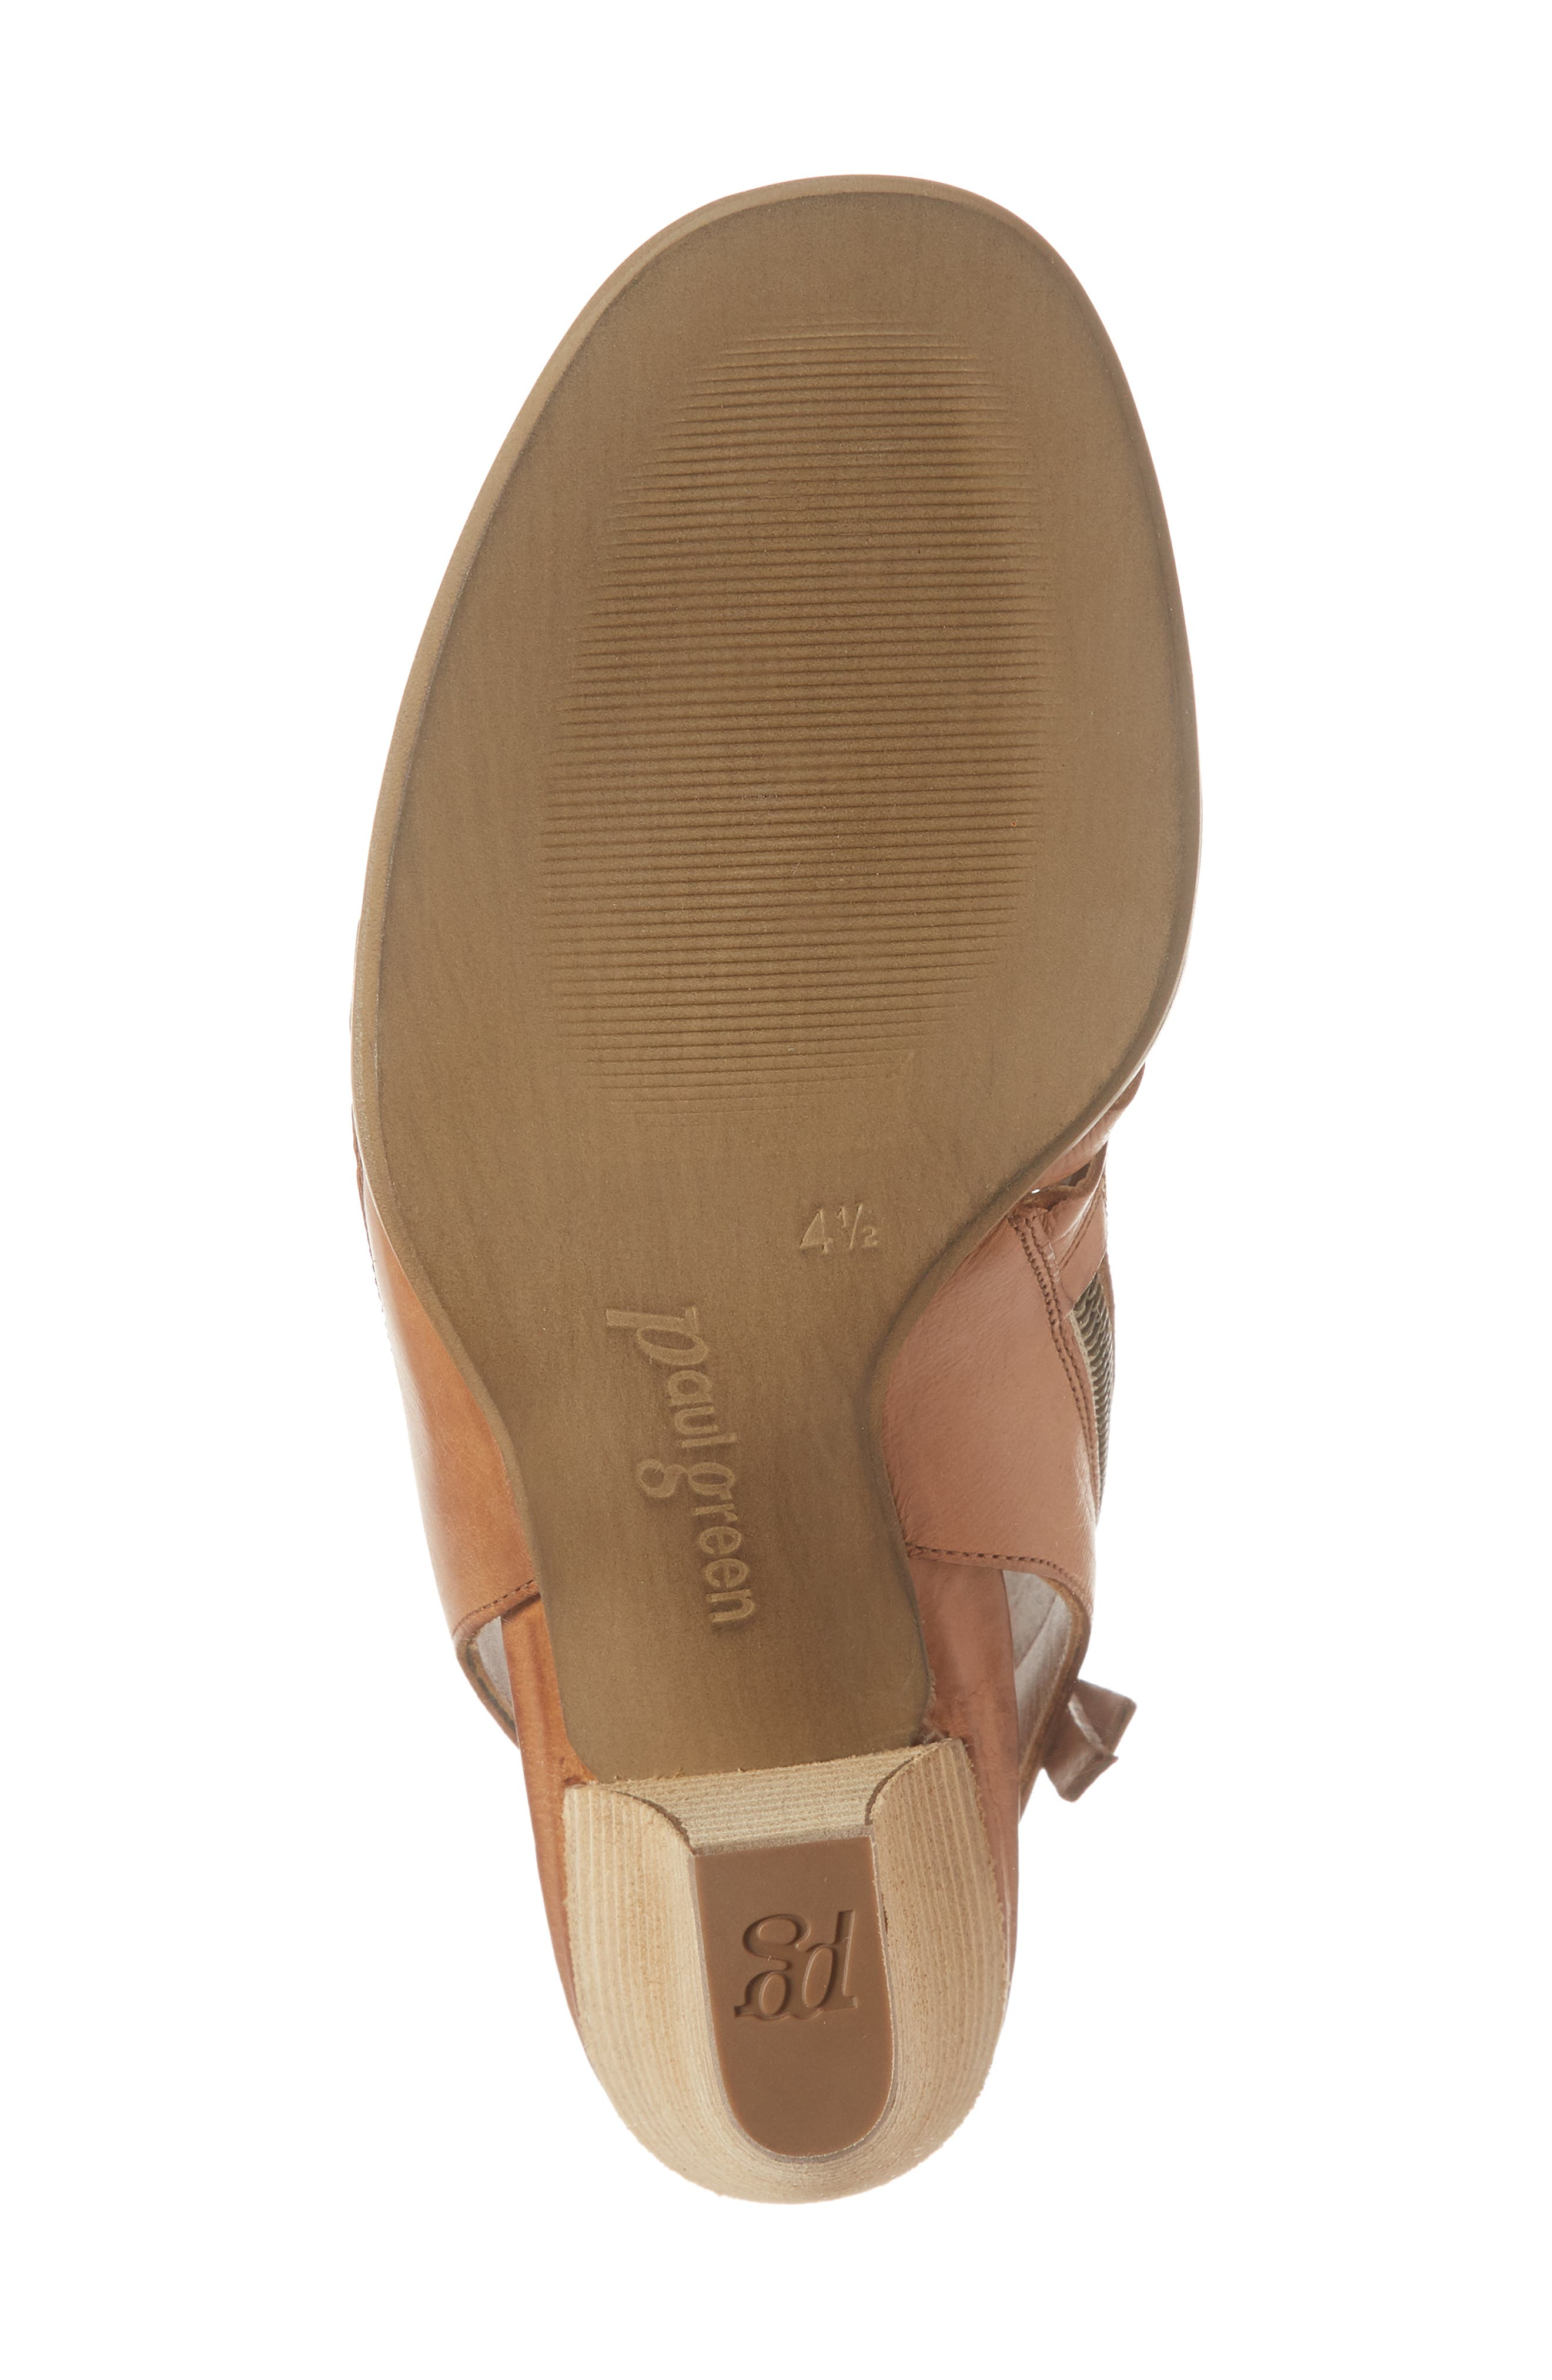 Rosa Woven Peep Toe Sandal,                             Alternate thumbnail 6, color,                             Cuoio Leather